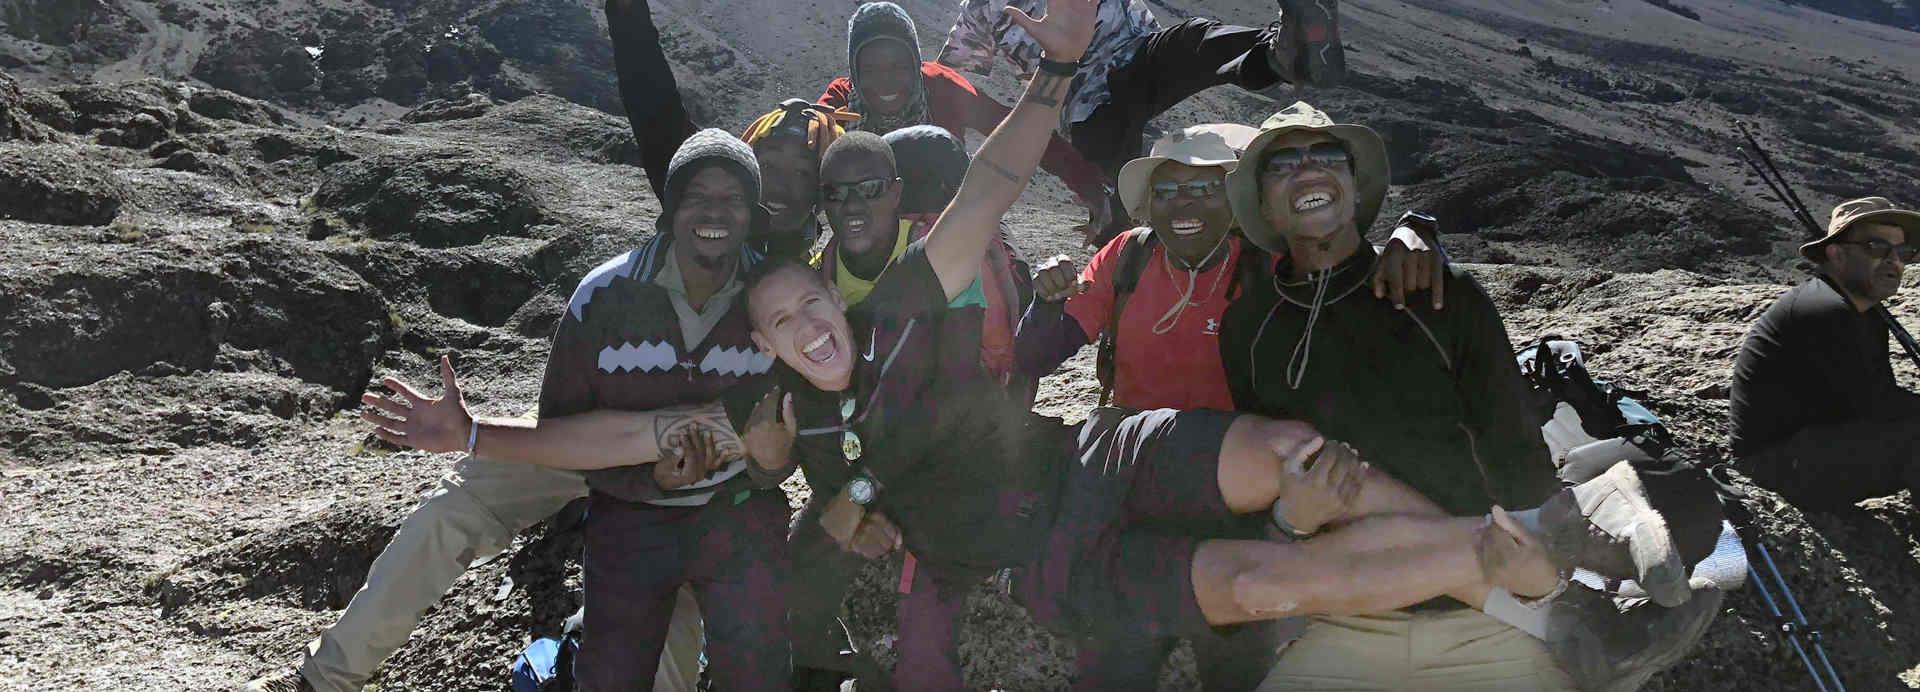 Scott Henley takes on Kilimanjaro with Ultra Adventures